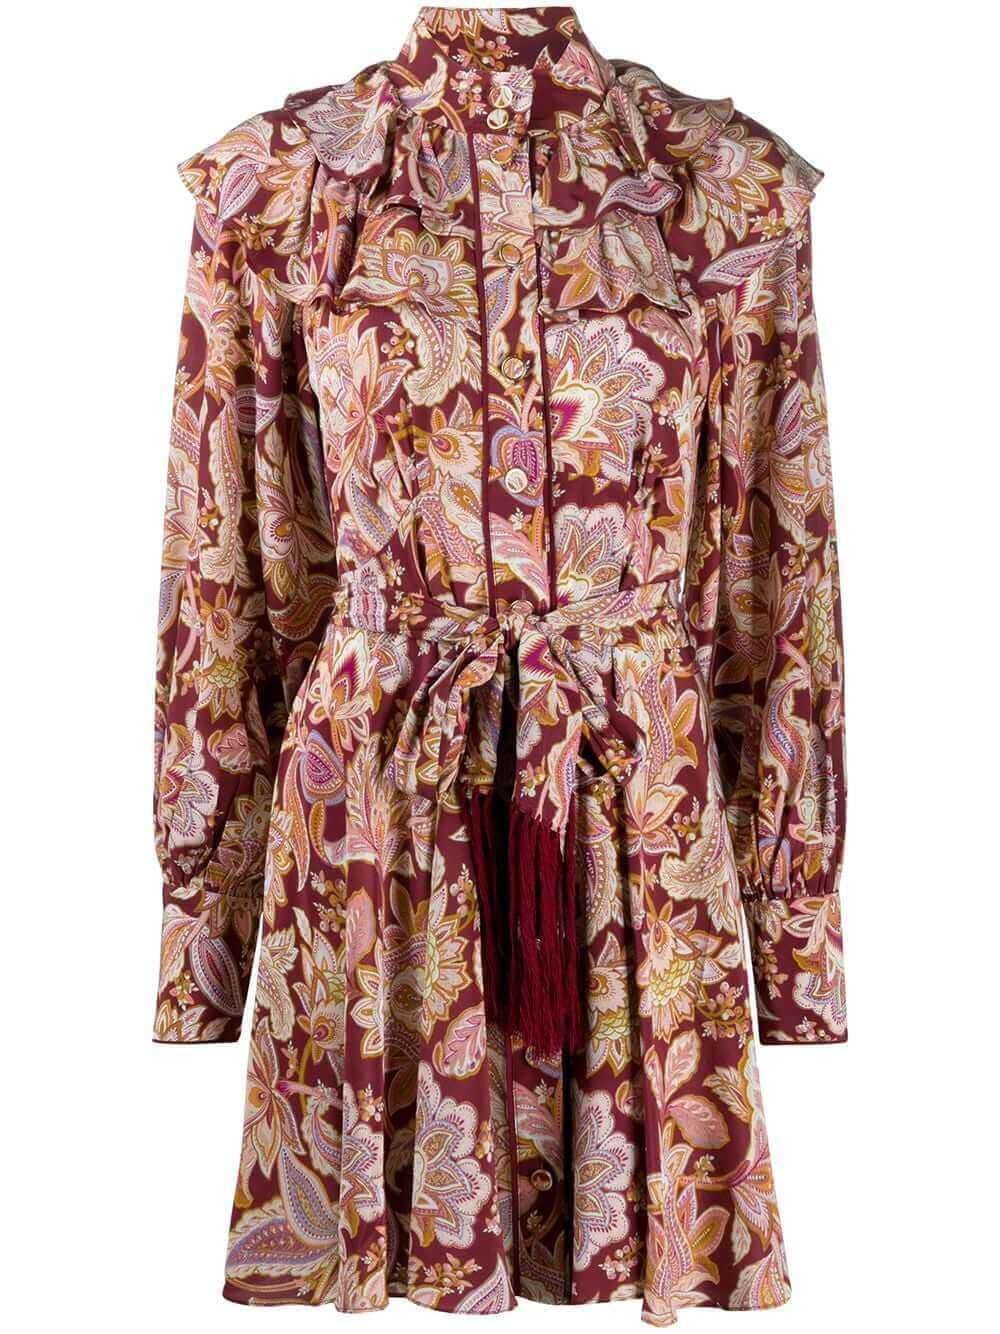 Fringe Detail Dress Item # 8949DCHA